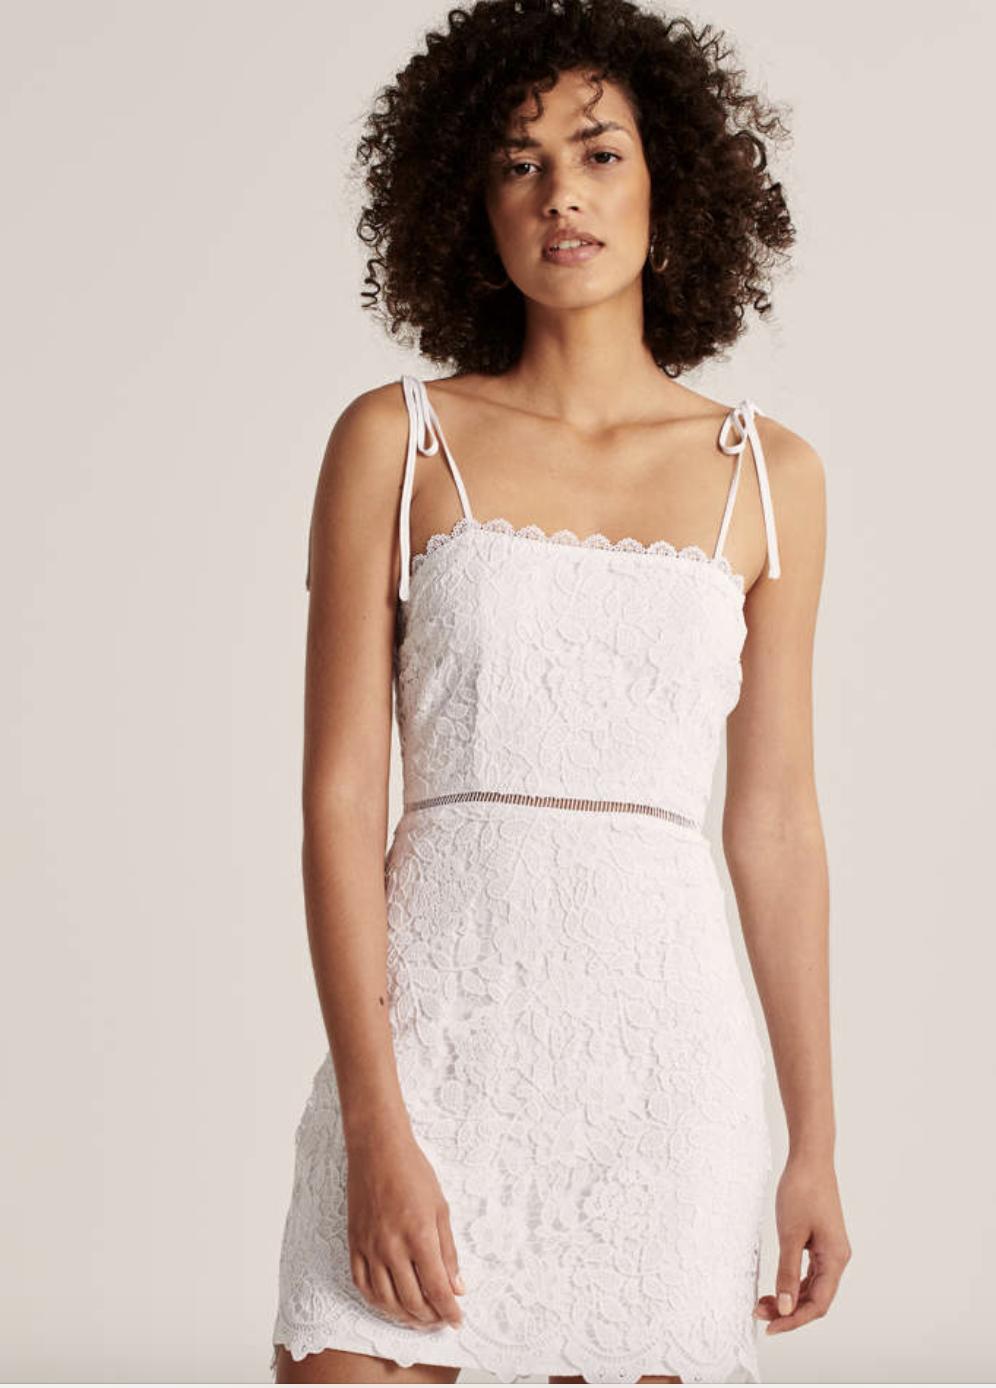 A&F 女款經典蕾絲洋裝 尺寸XXS-XL $2180/件